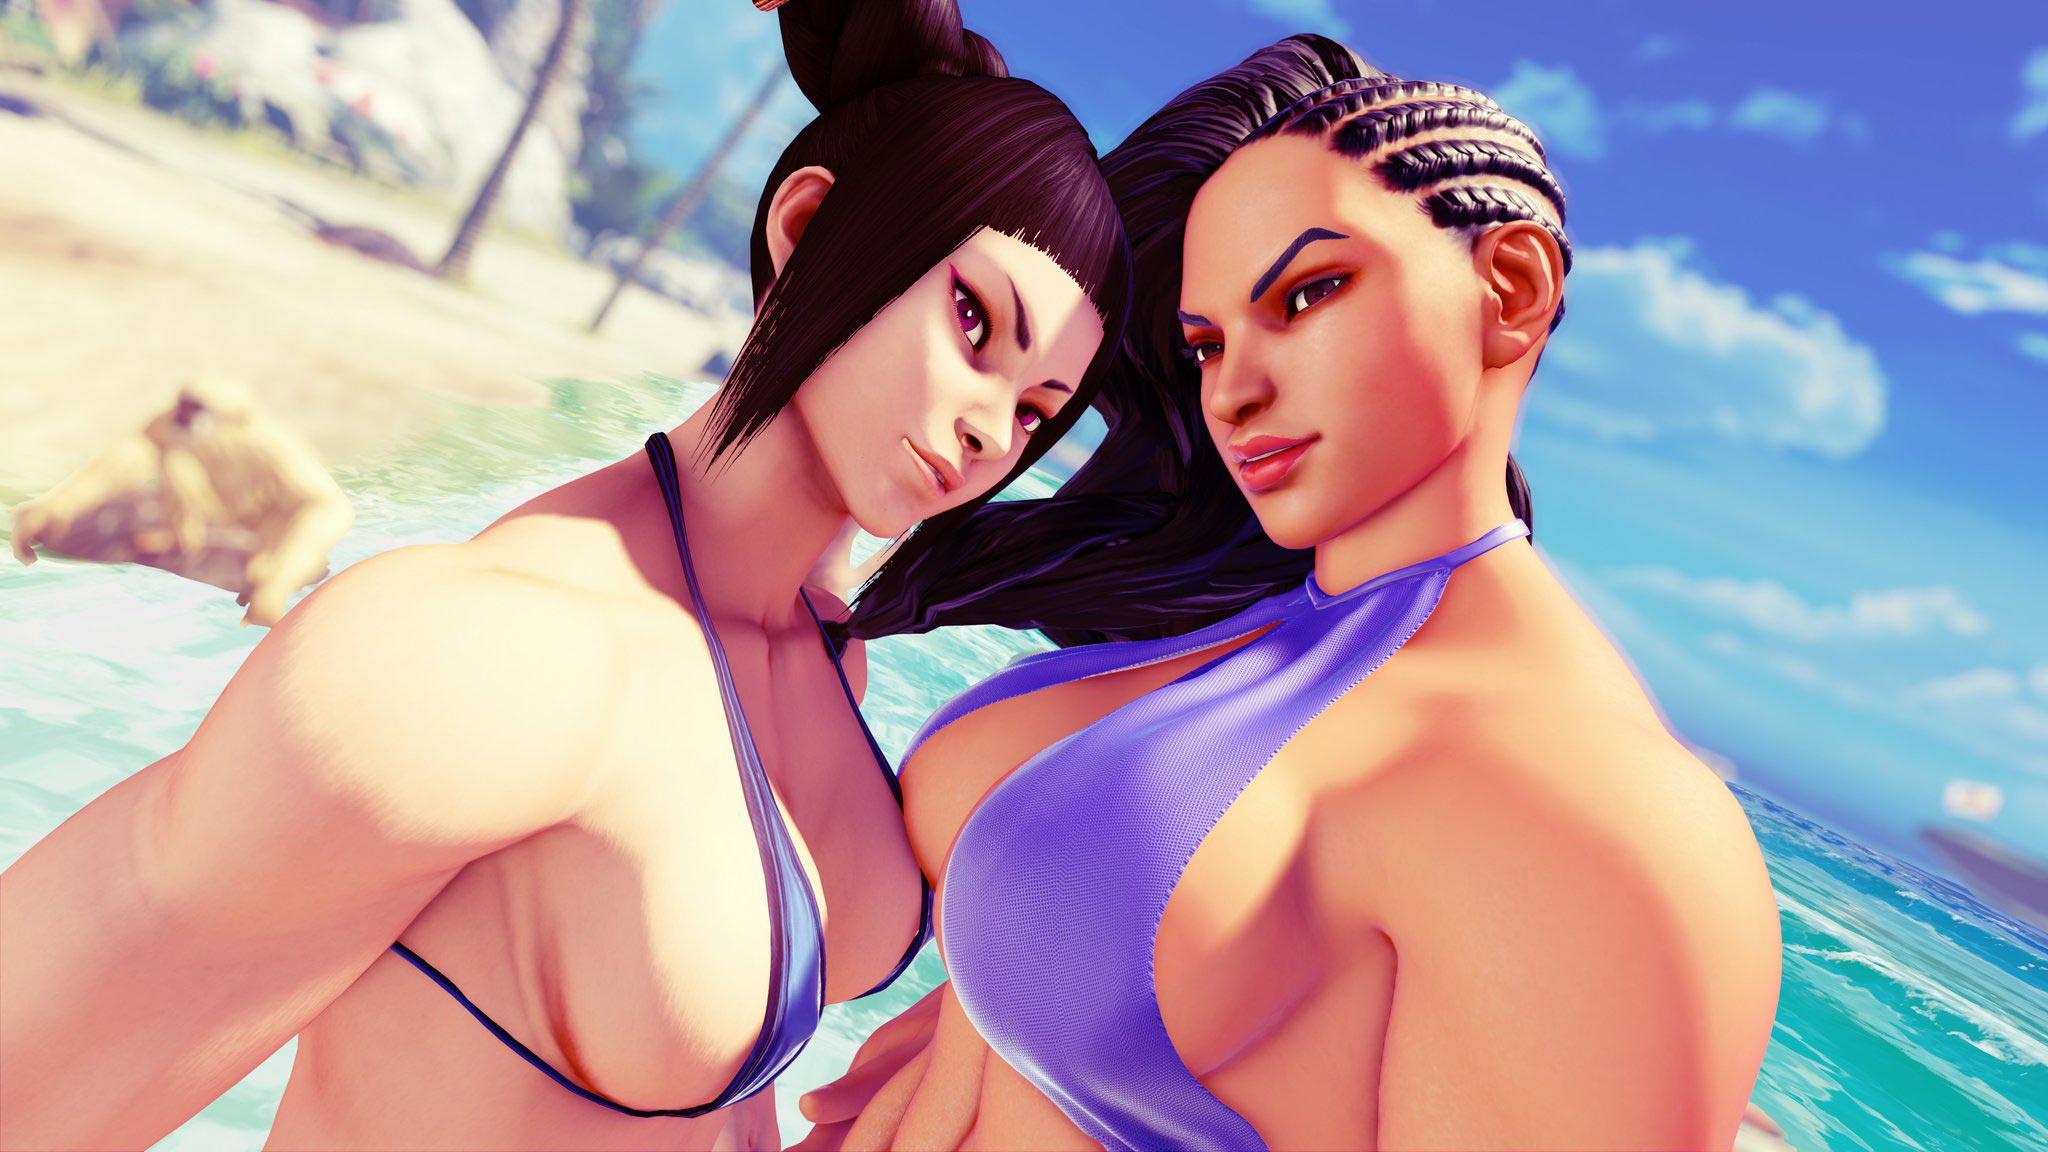 Eden's Street Fighter stills 3 out of 12 image gallery